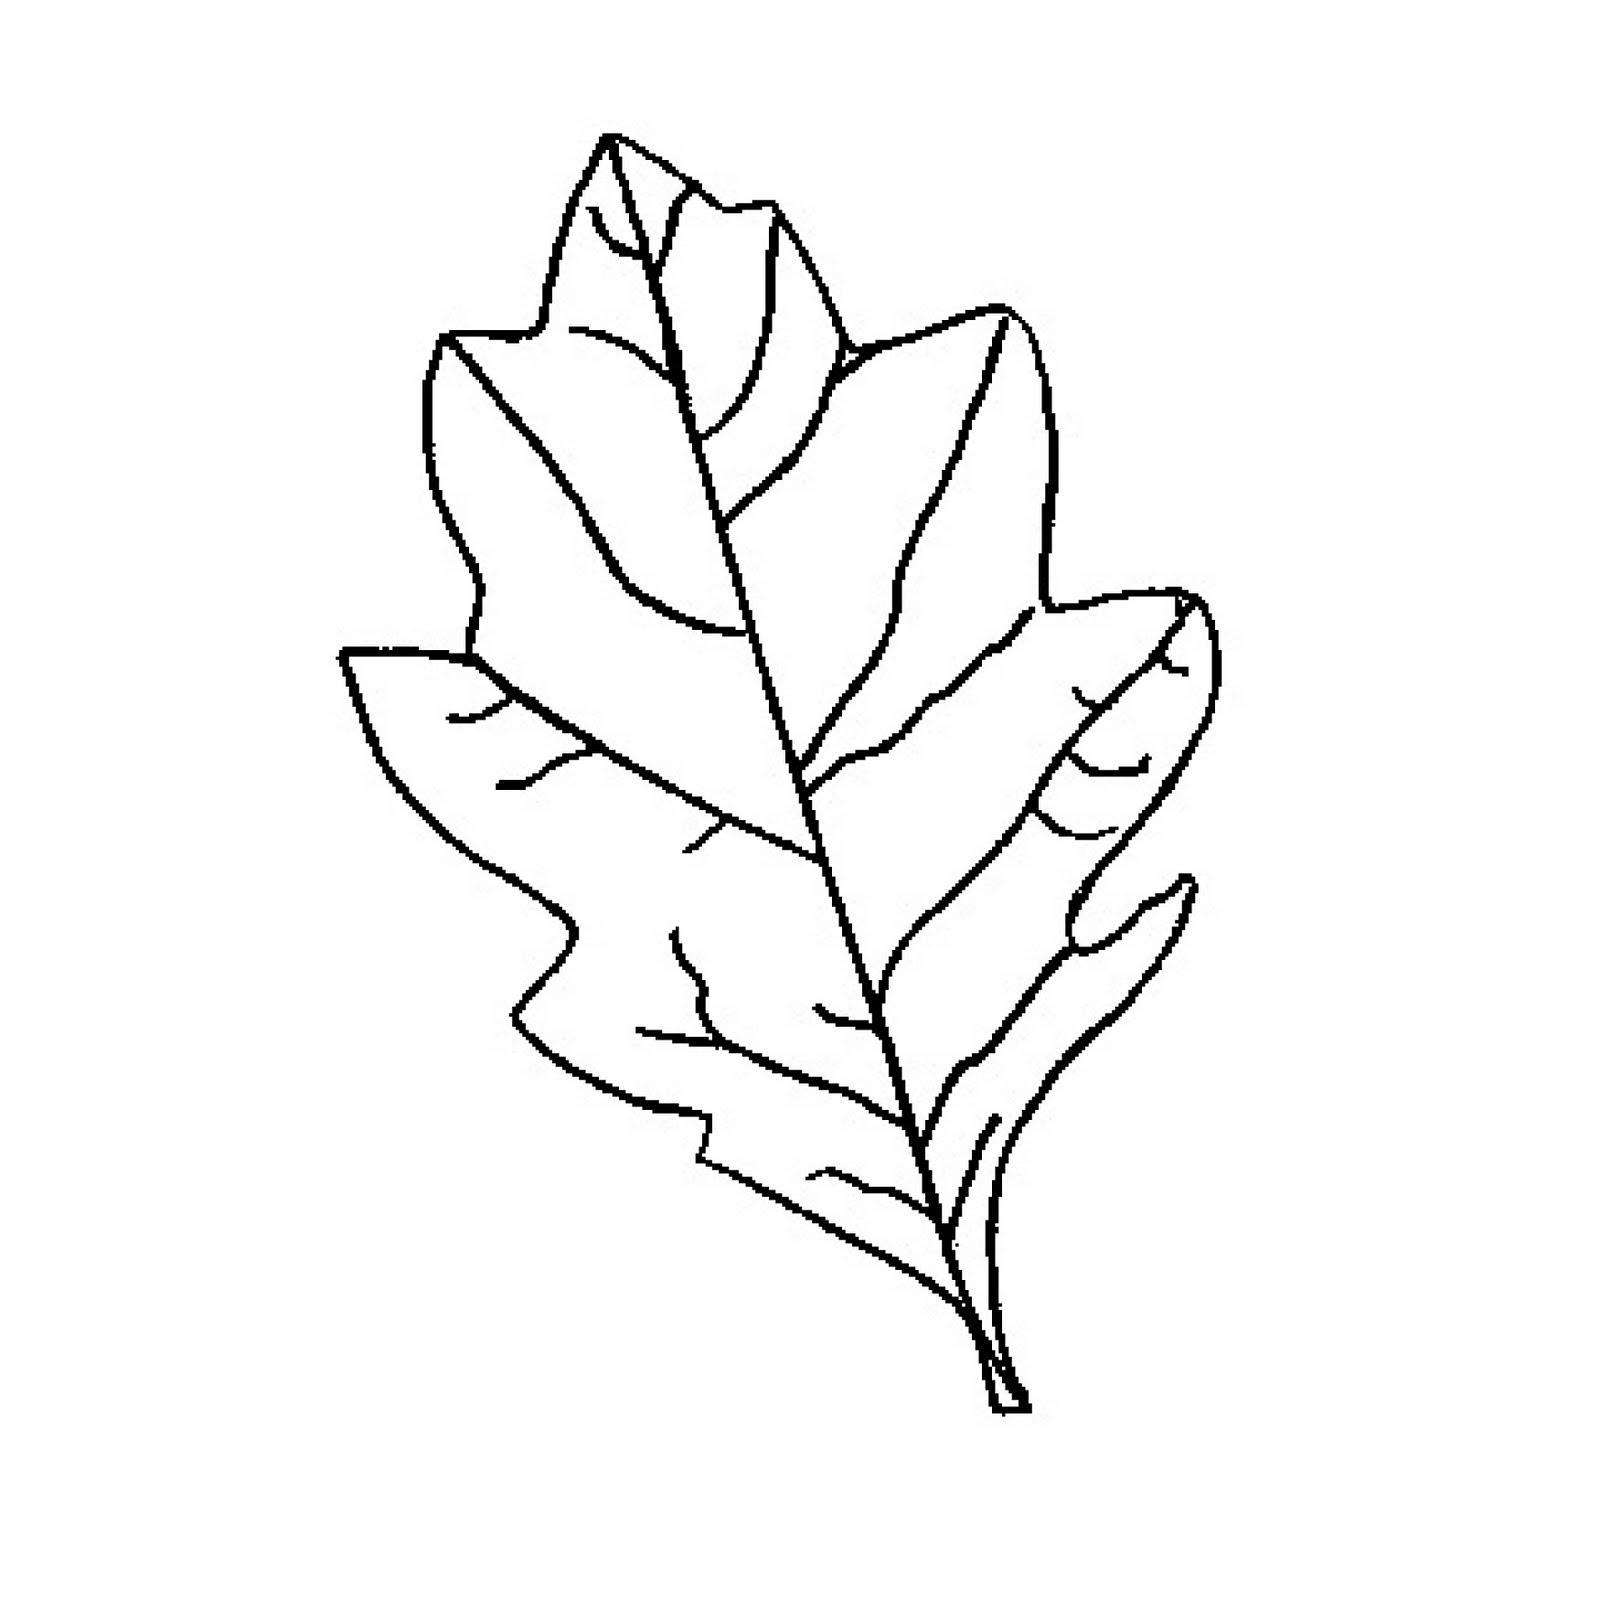 Jungle Leaves Drawing At Getdrawings